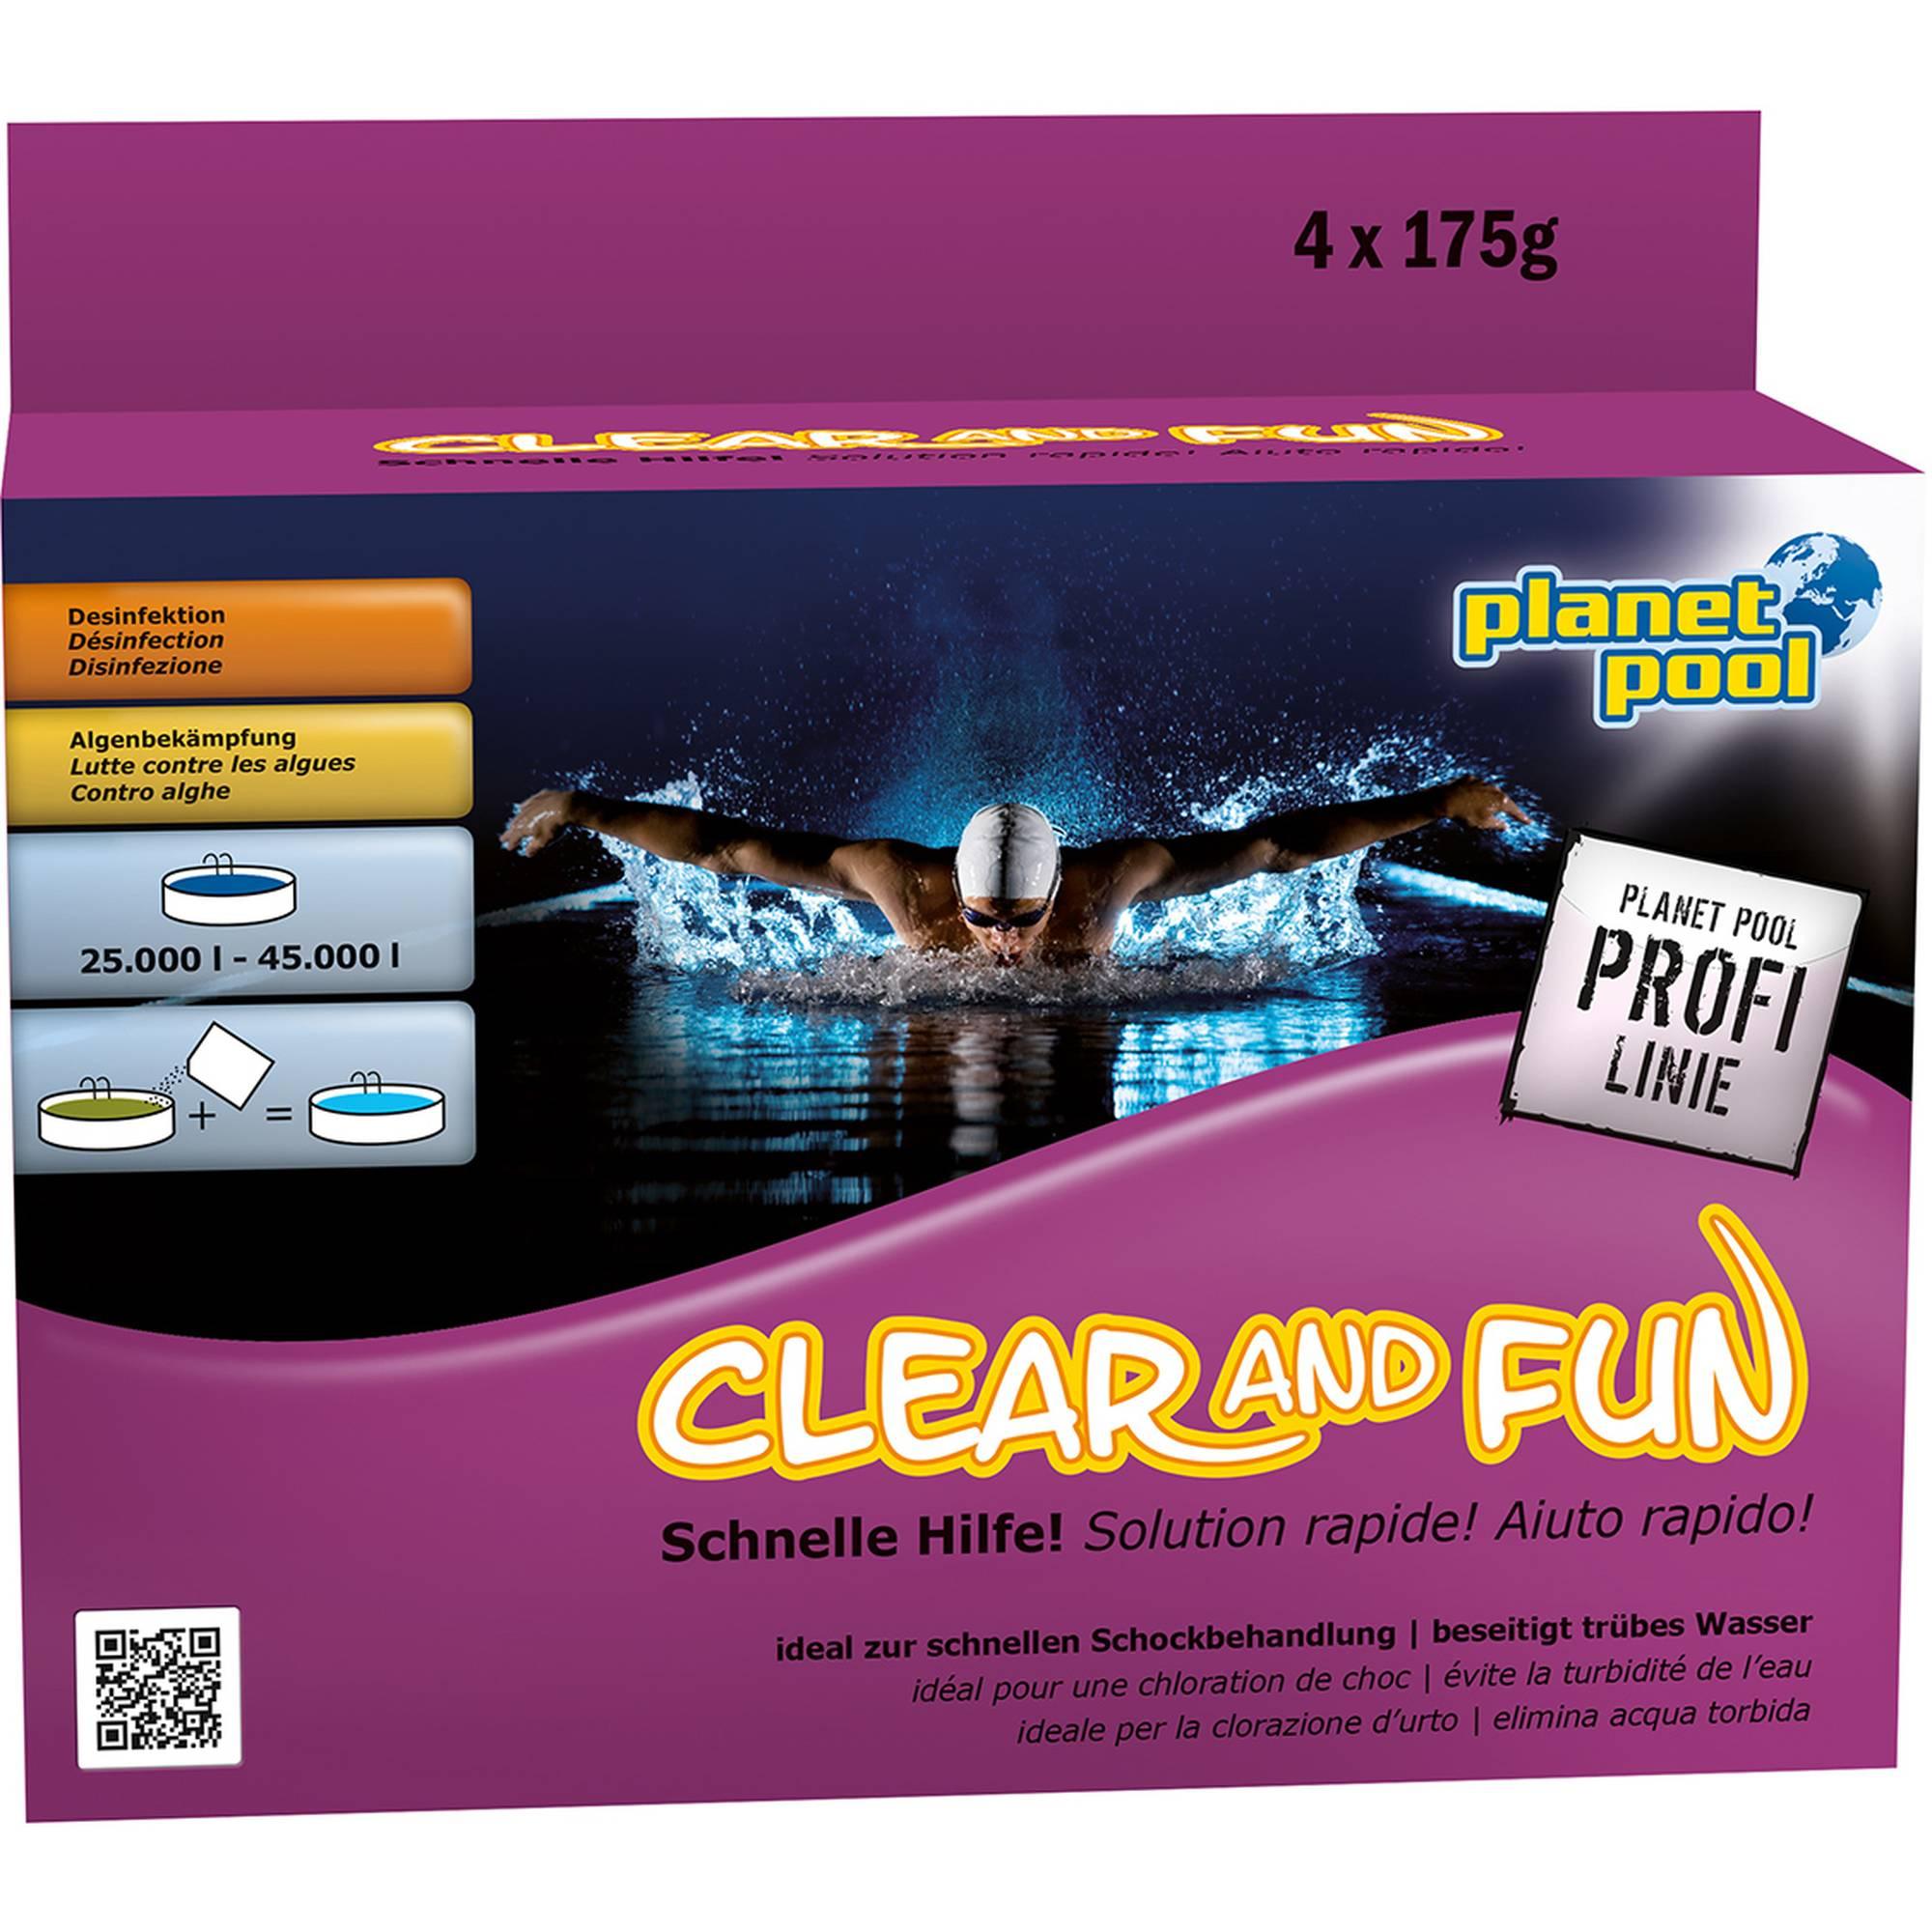 PLANET POOL - Profi Linie   Clear and Fun Big Wasserpflegeset